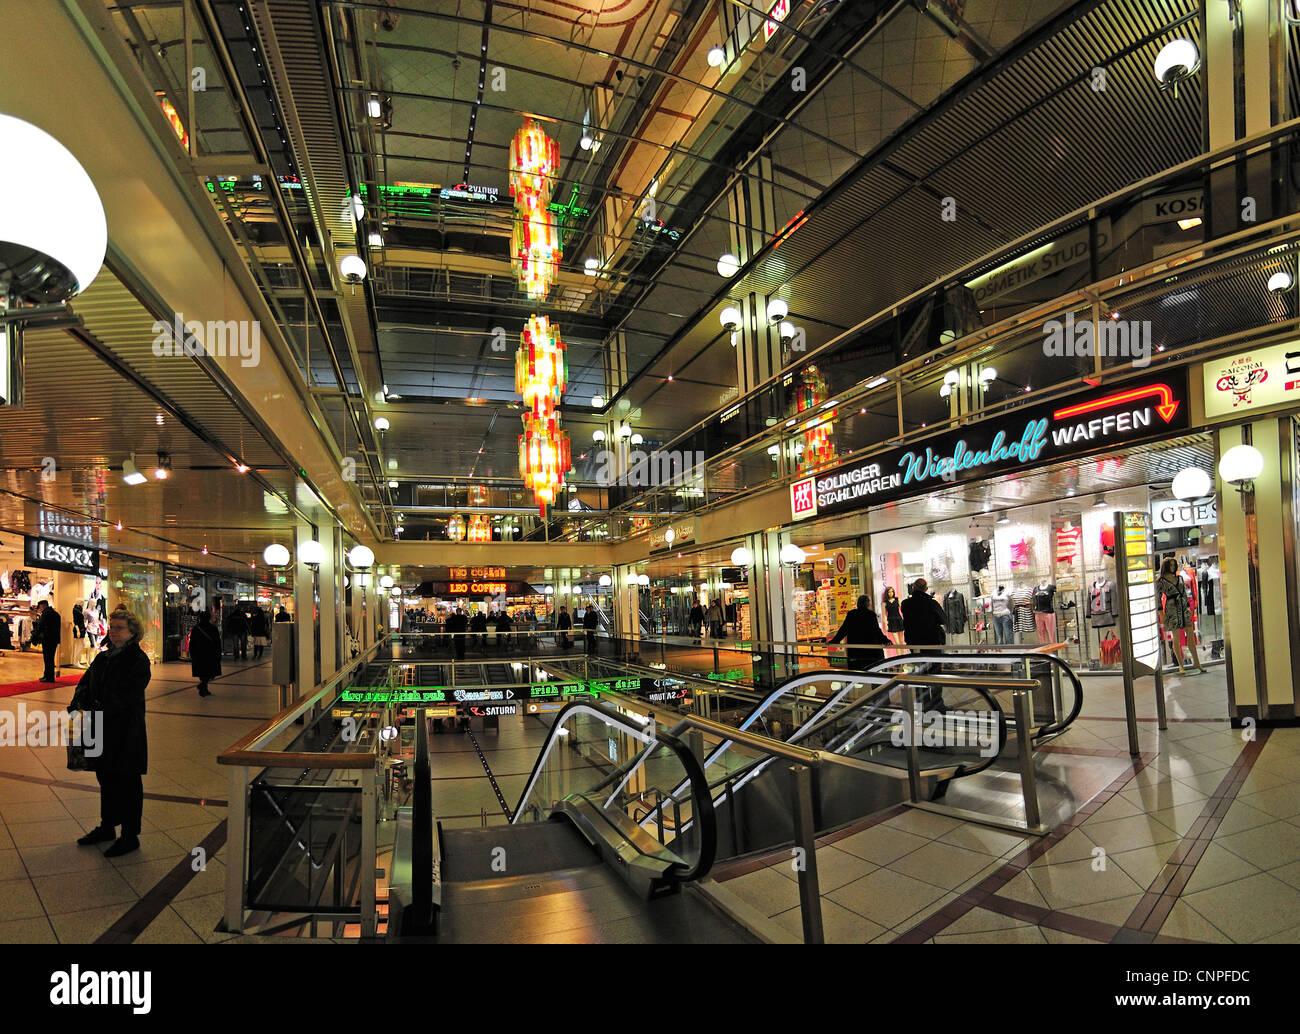 Berlin, Germany. Europa-Center in Breitscheidplatz. - Stock Image